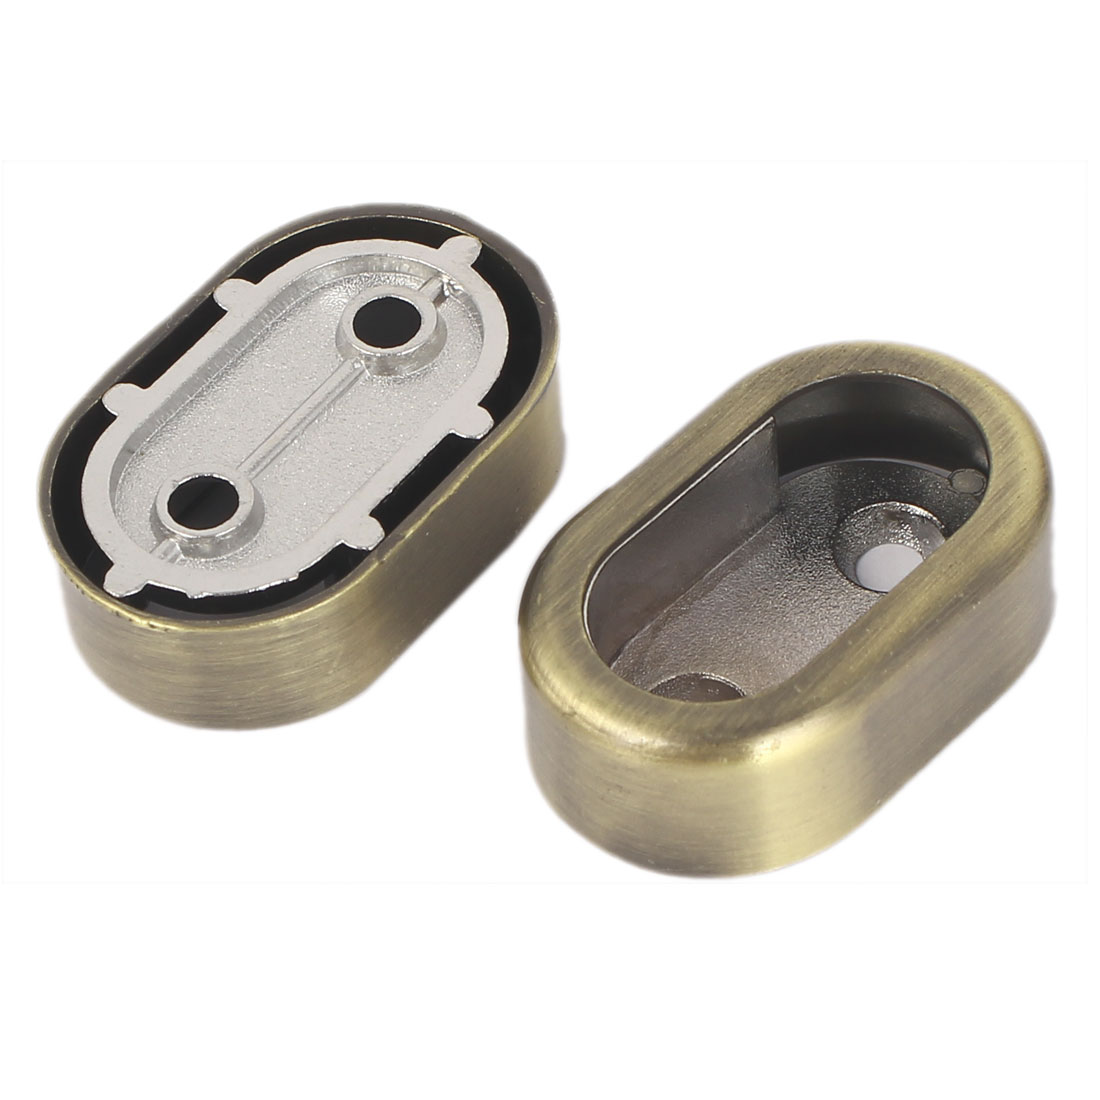 Cabinet Closet Metal Rod Flange Wardrobe Rail Support Bronze Tone 2pcs